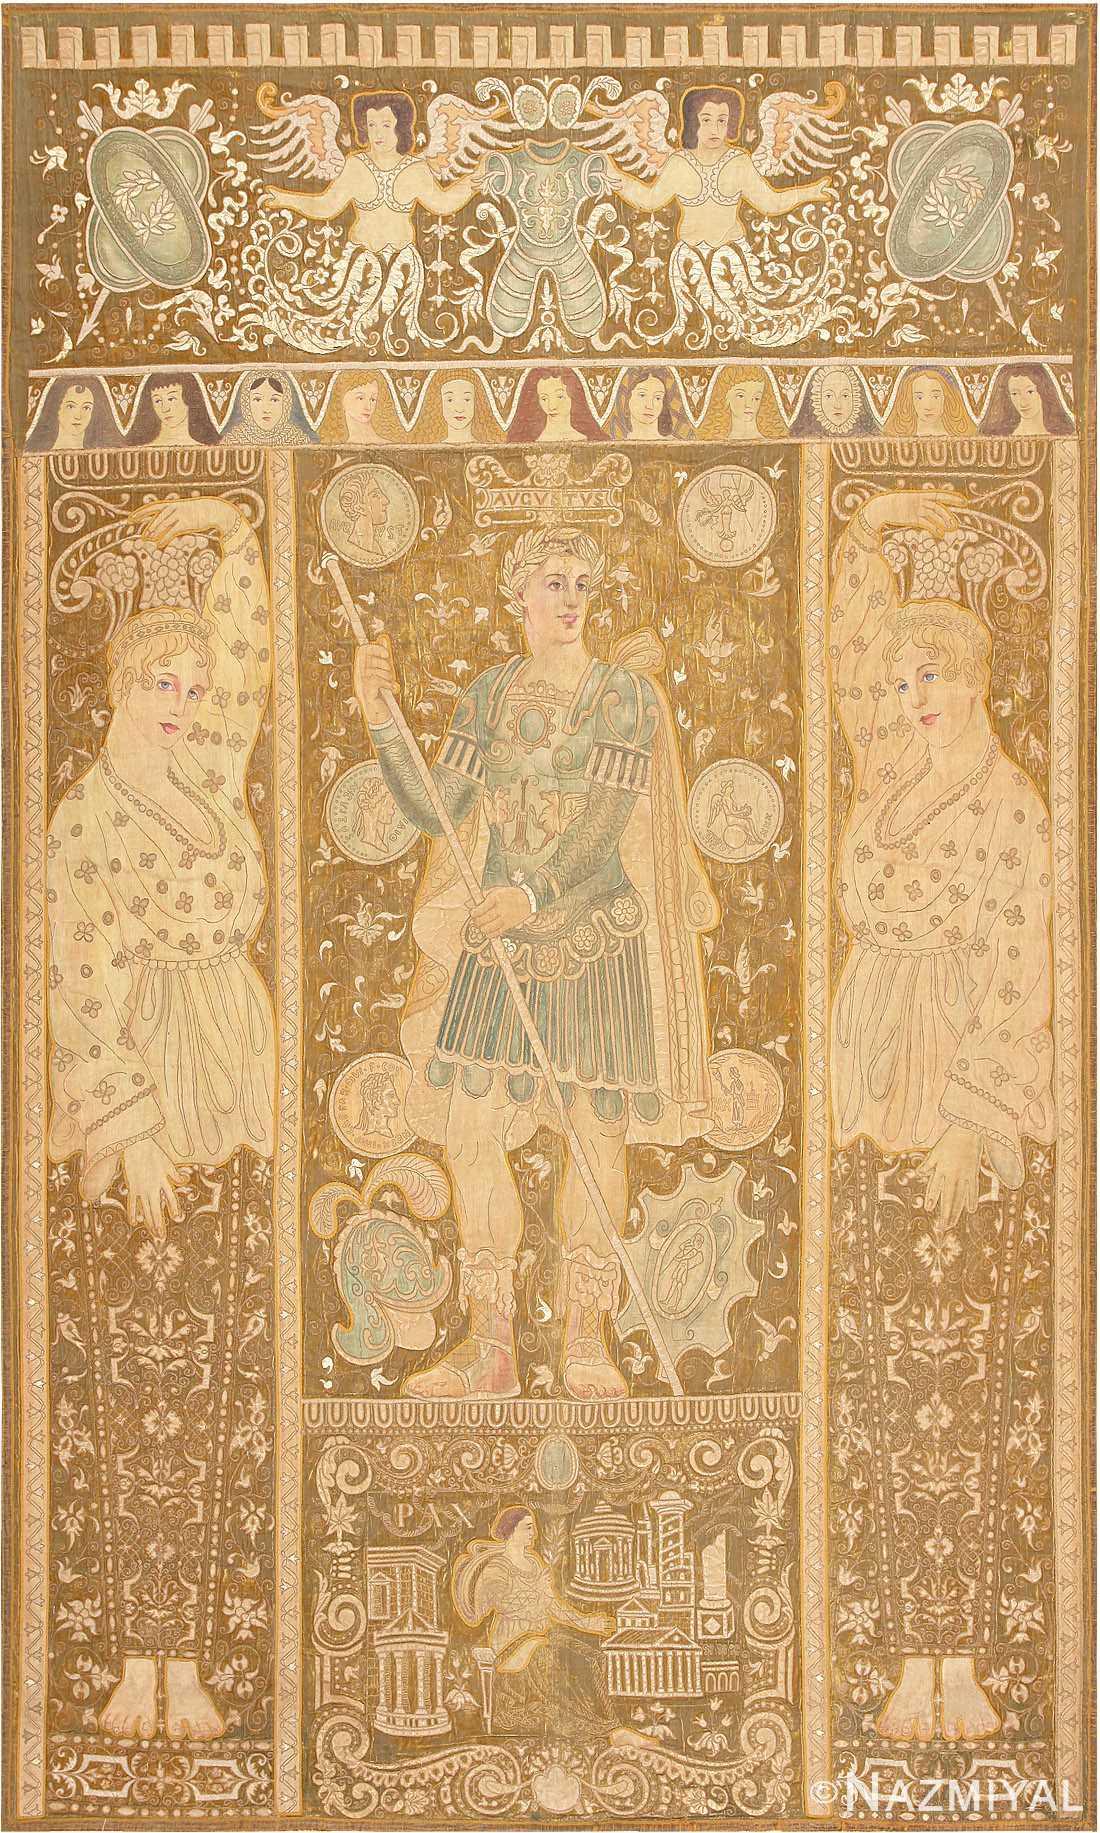 Beautiful Antique Italian Tapestry depicting Caesar Augustus Roman Emperor Octavian 47325 Large Image by Nazmiyal